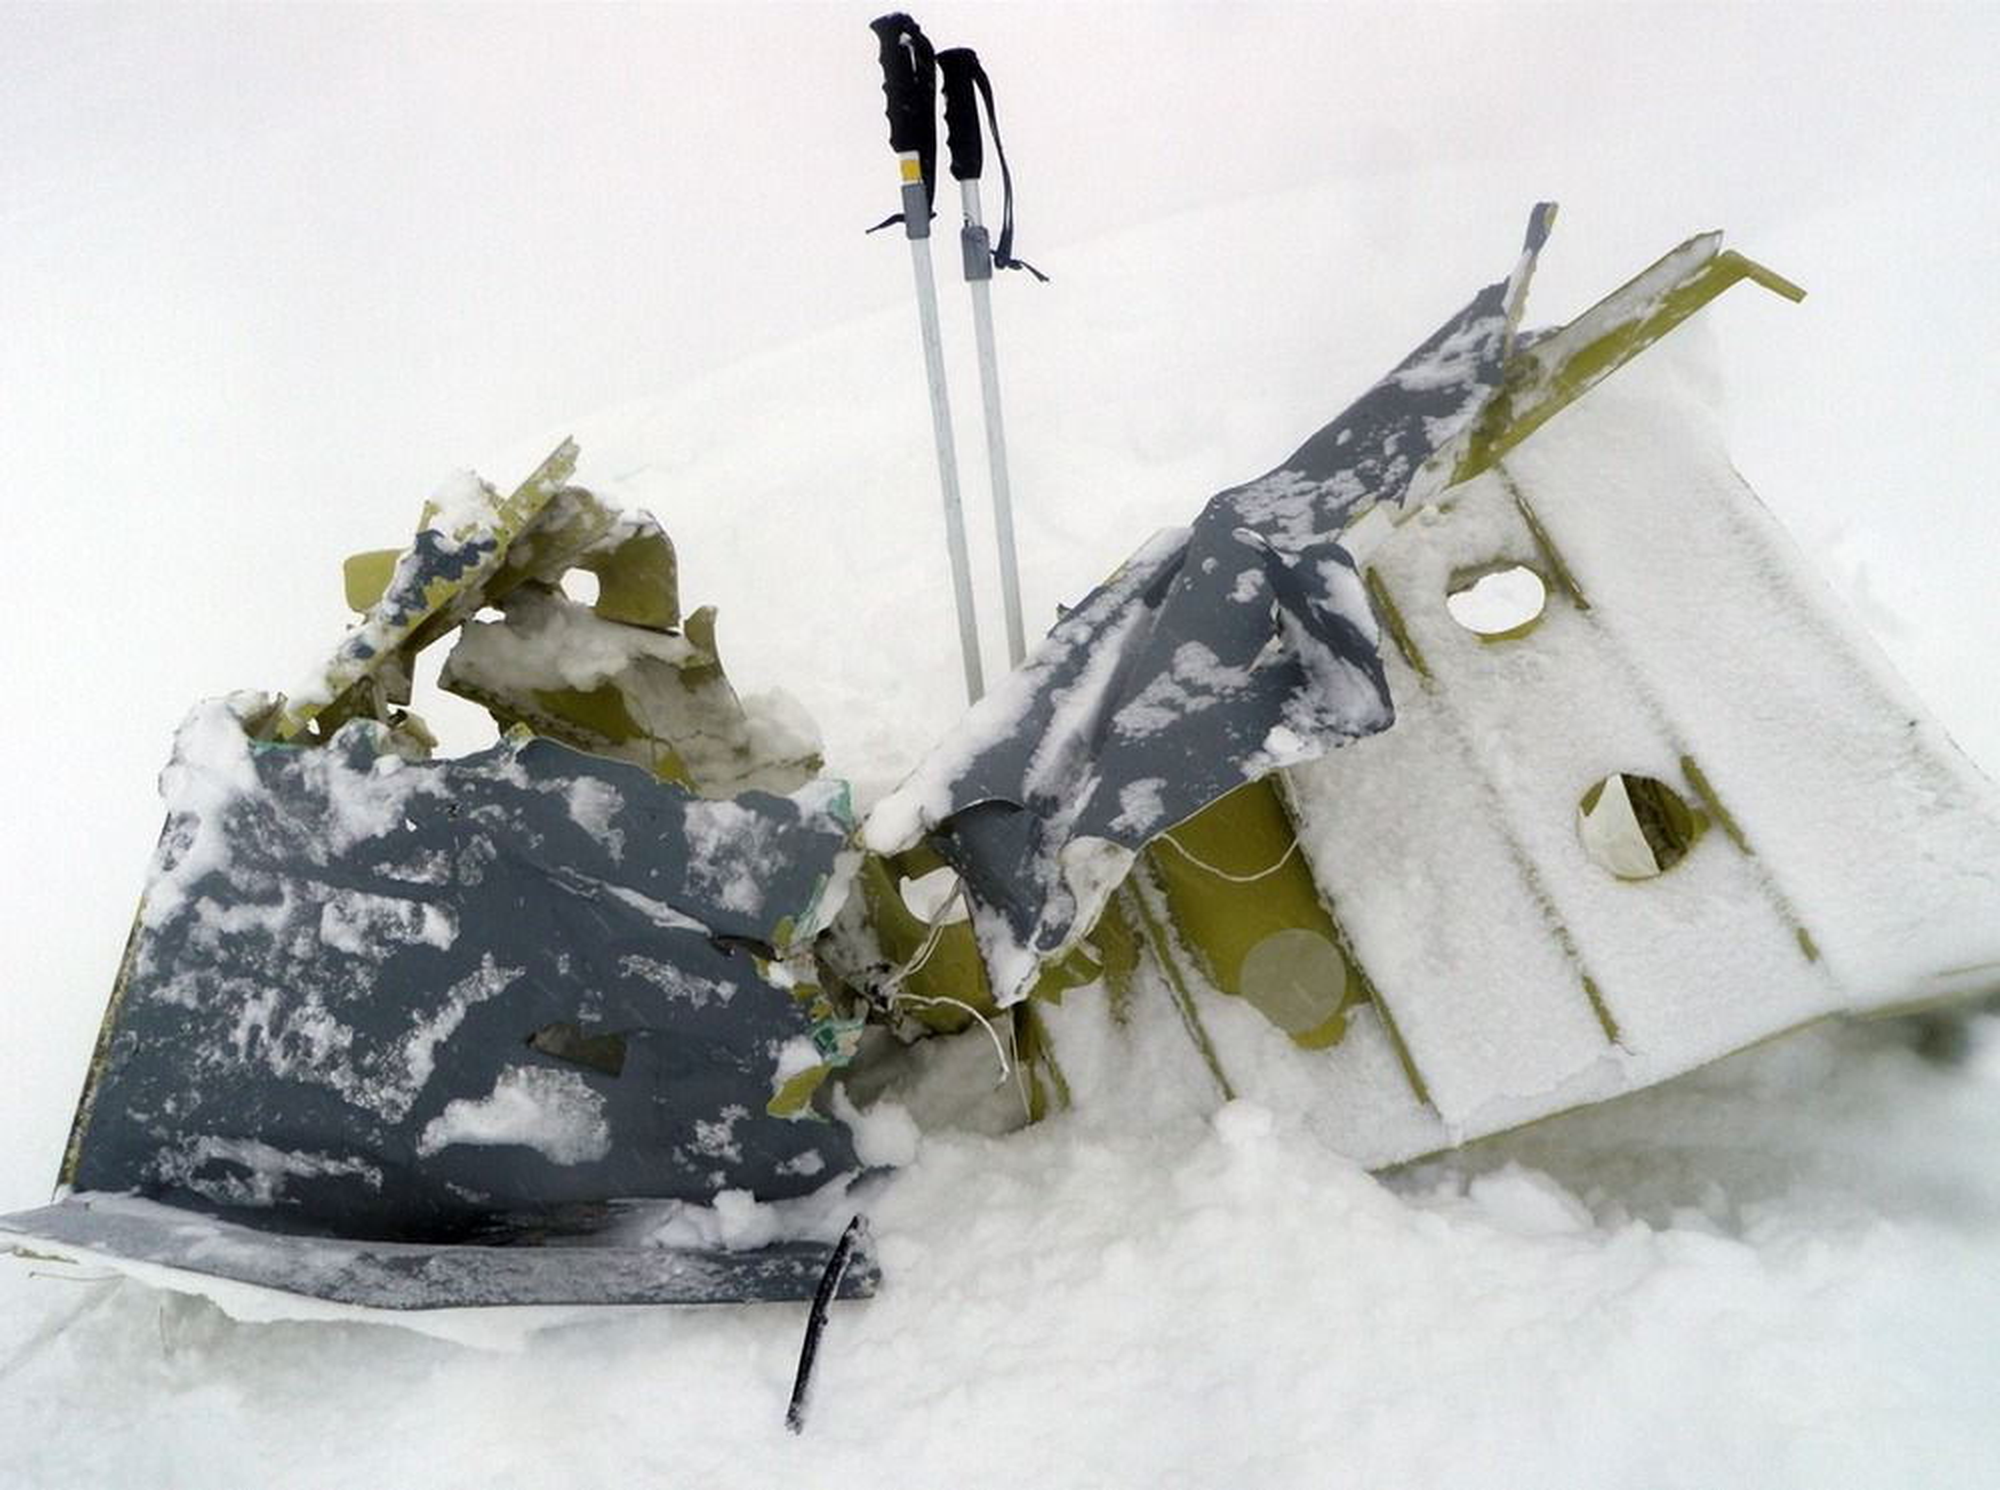 ULYKKEN MED SUPER HERCULES C-130J SIV